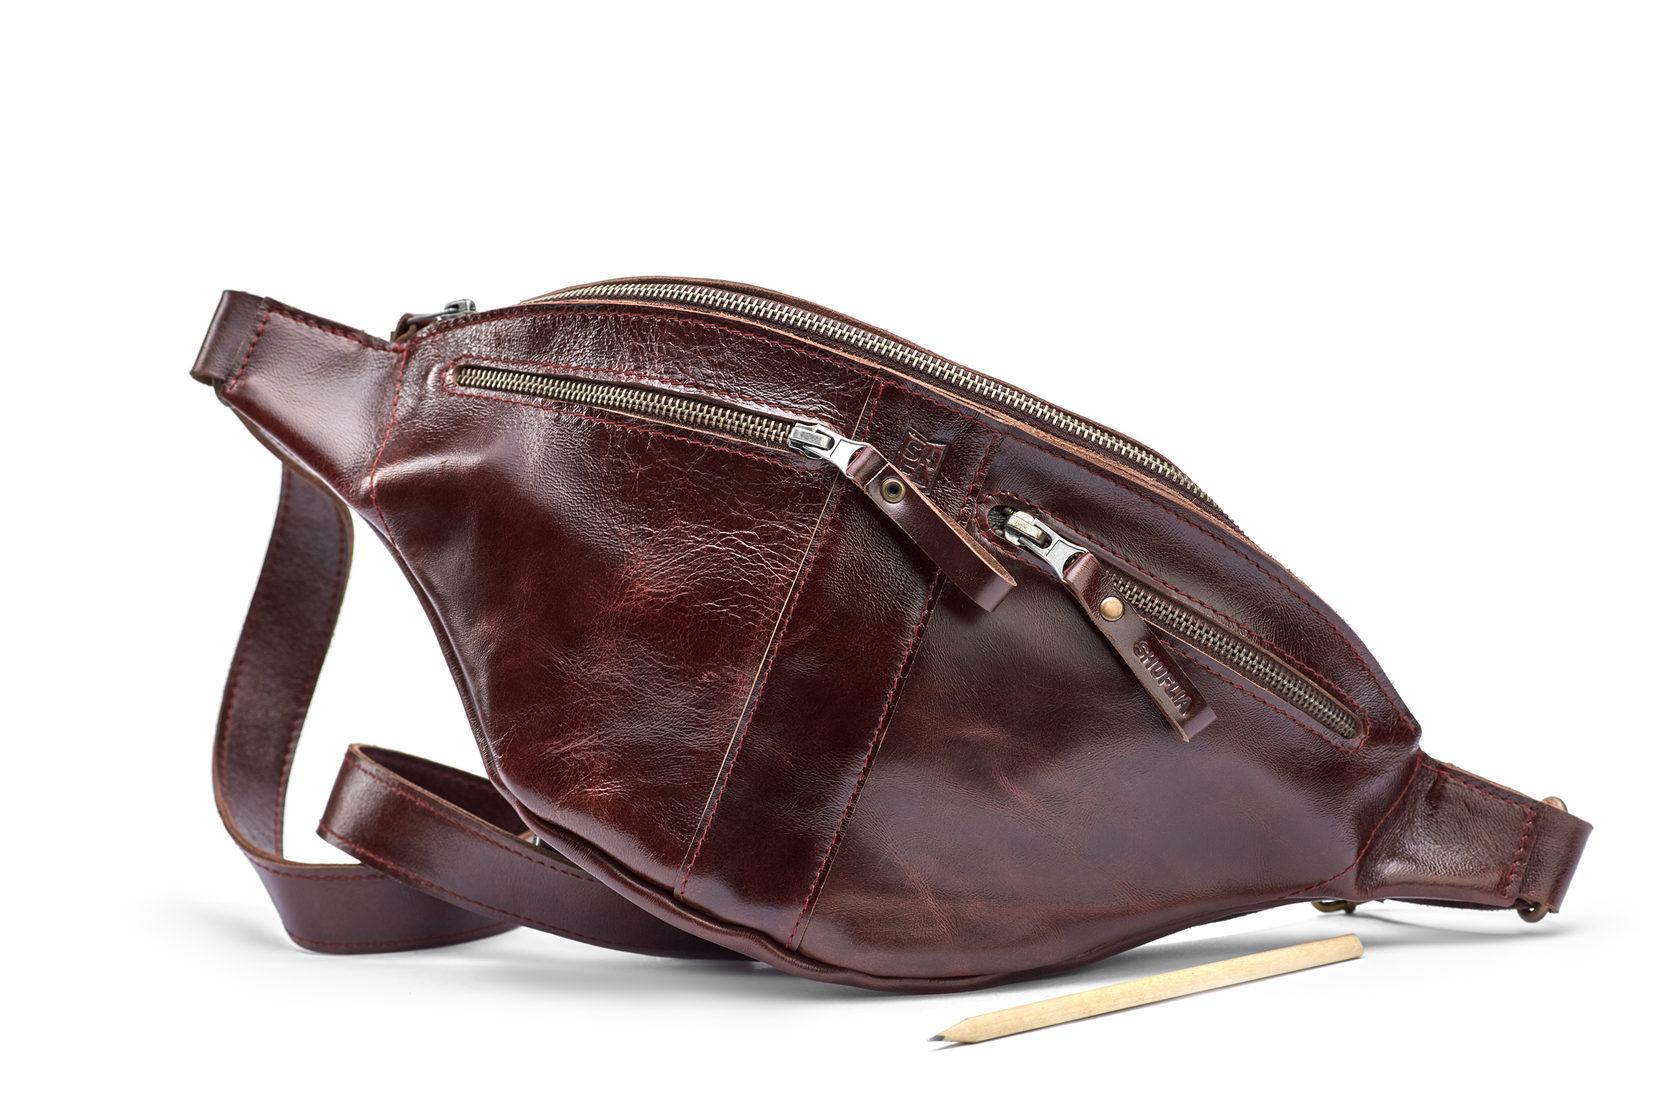 Шкіряна сумка CALZONE | Shuflia